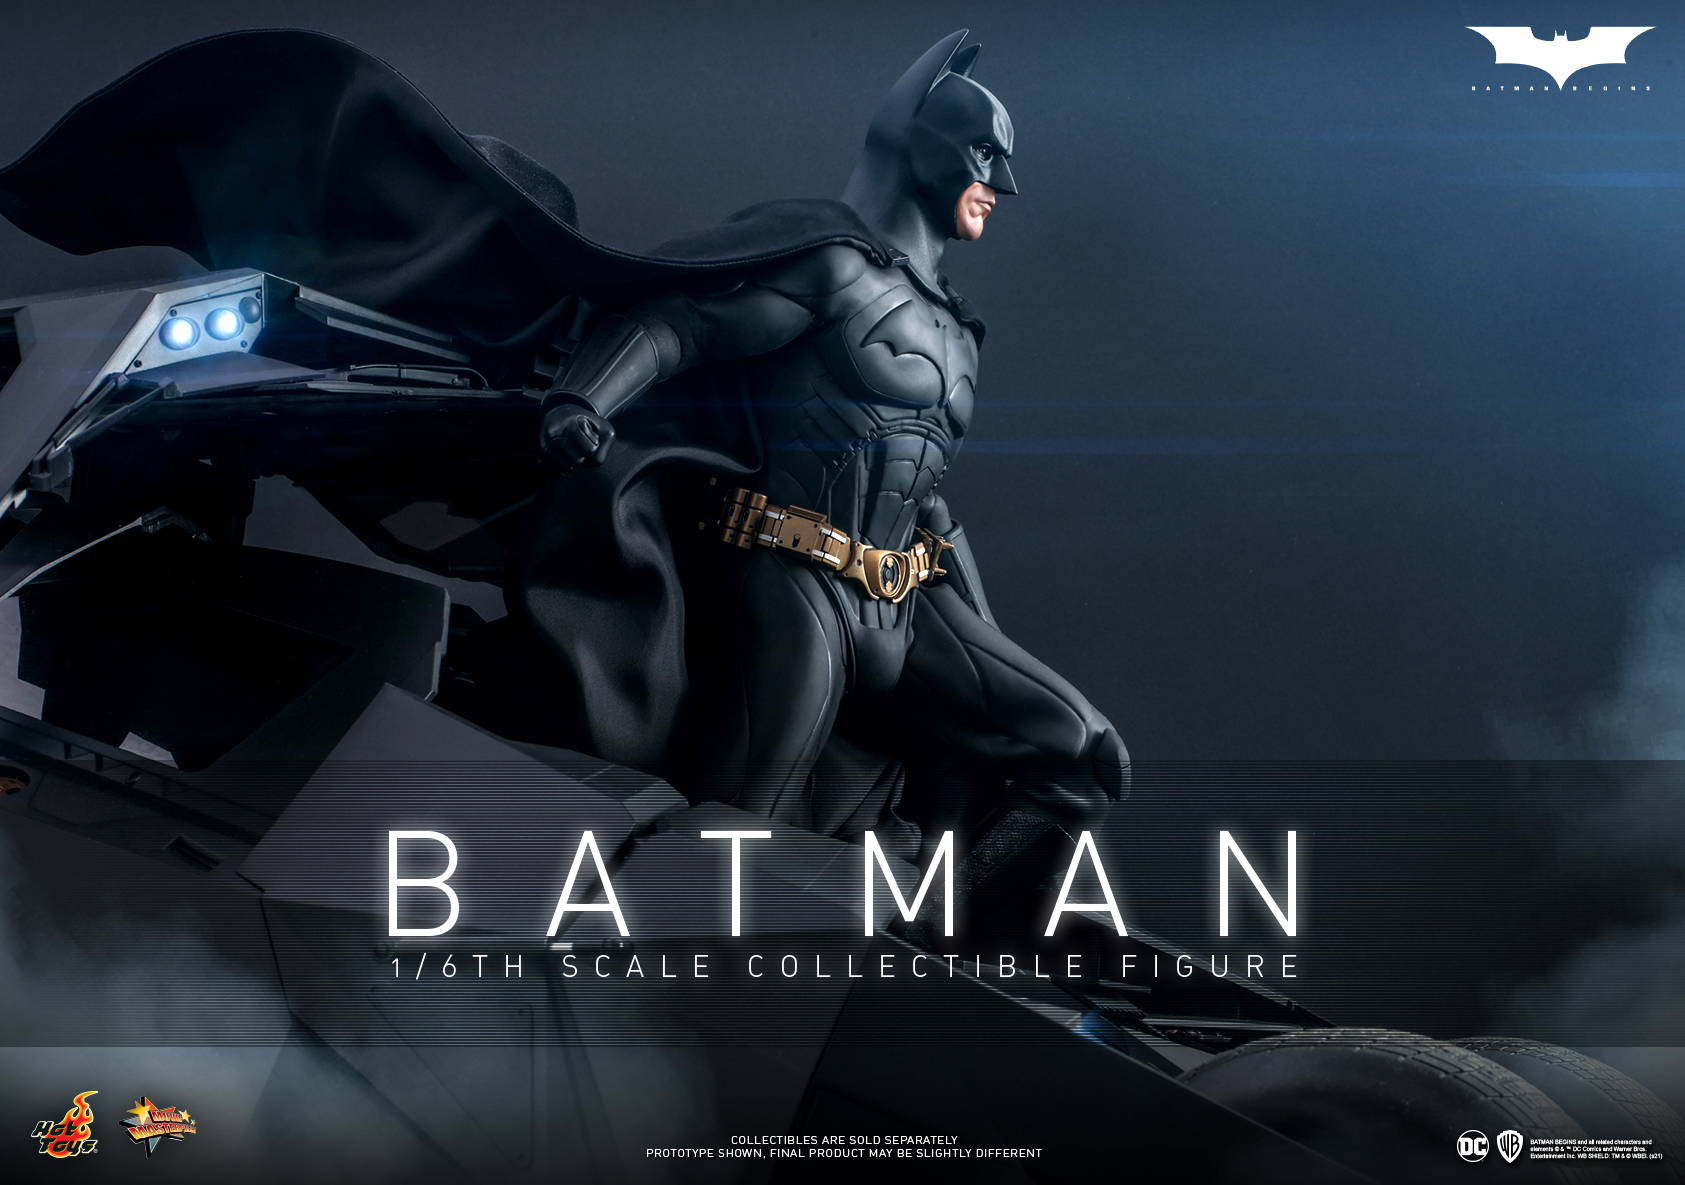 Hot Toys - Batman Begins - Batman collectible figure_Poster